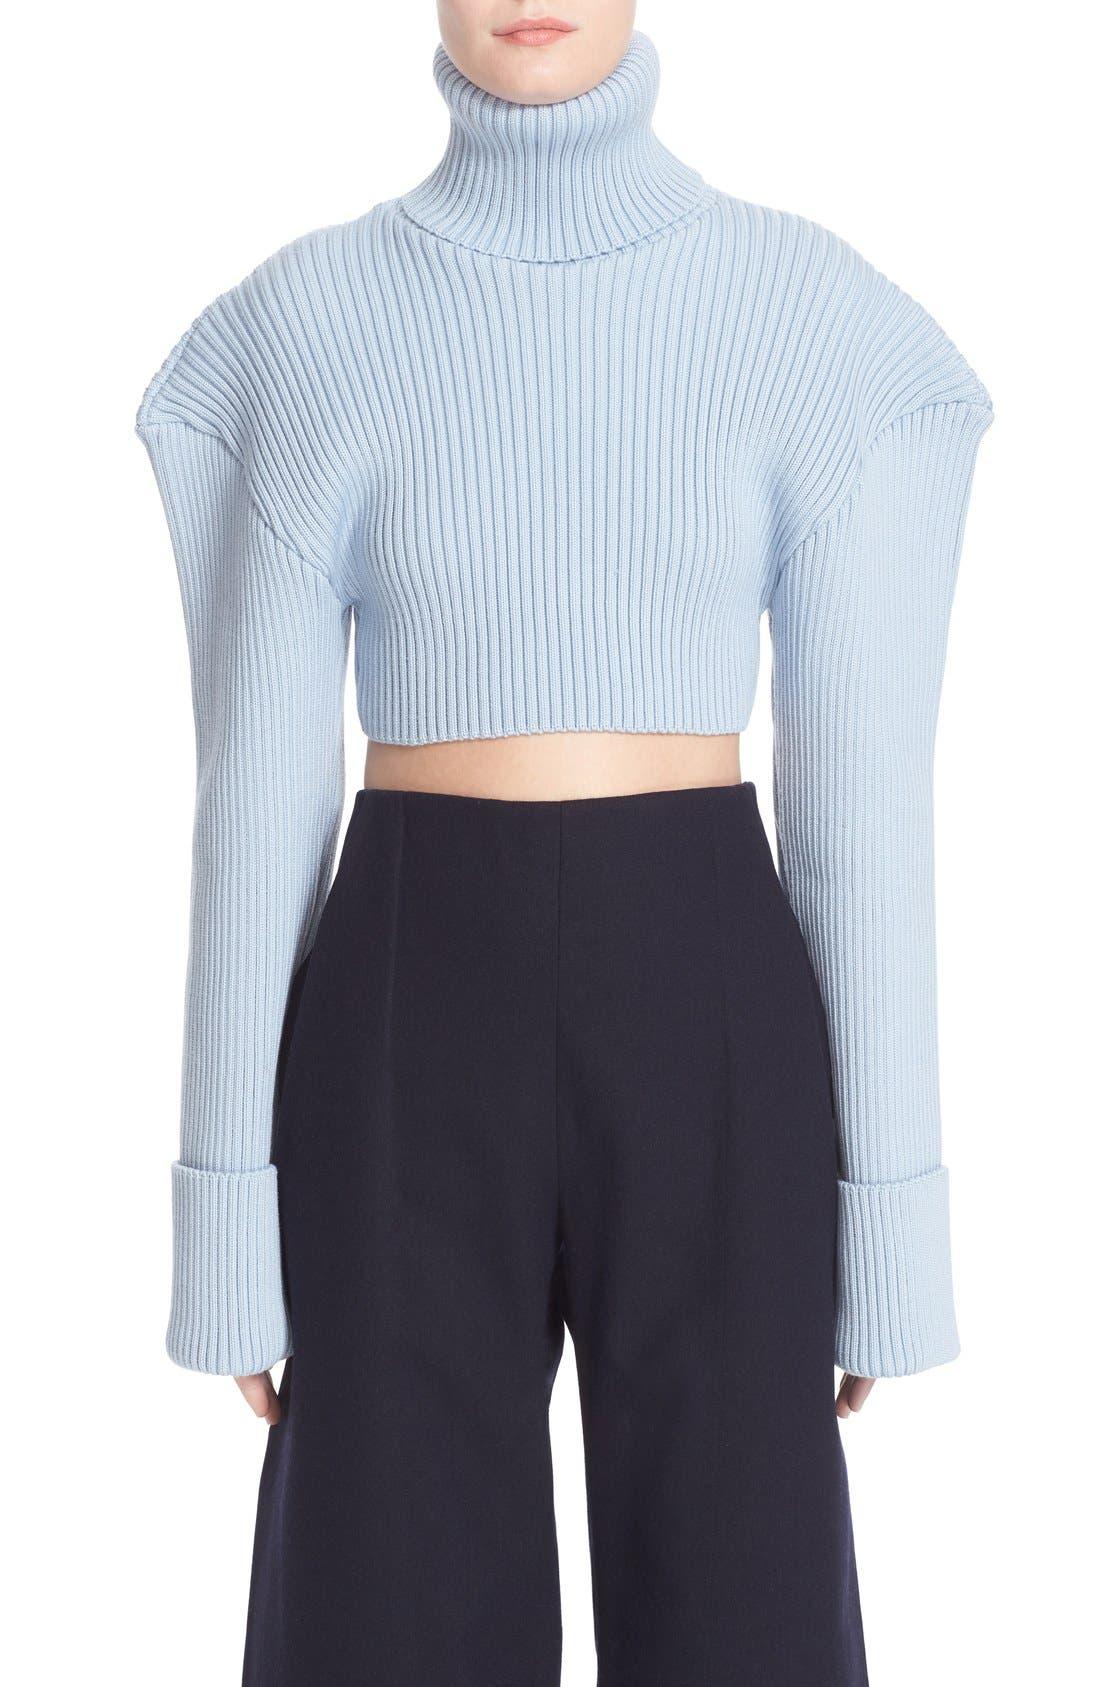 Main Image - Jacquemus Cropped Football Shoulder Turtleneck Sweater